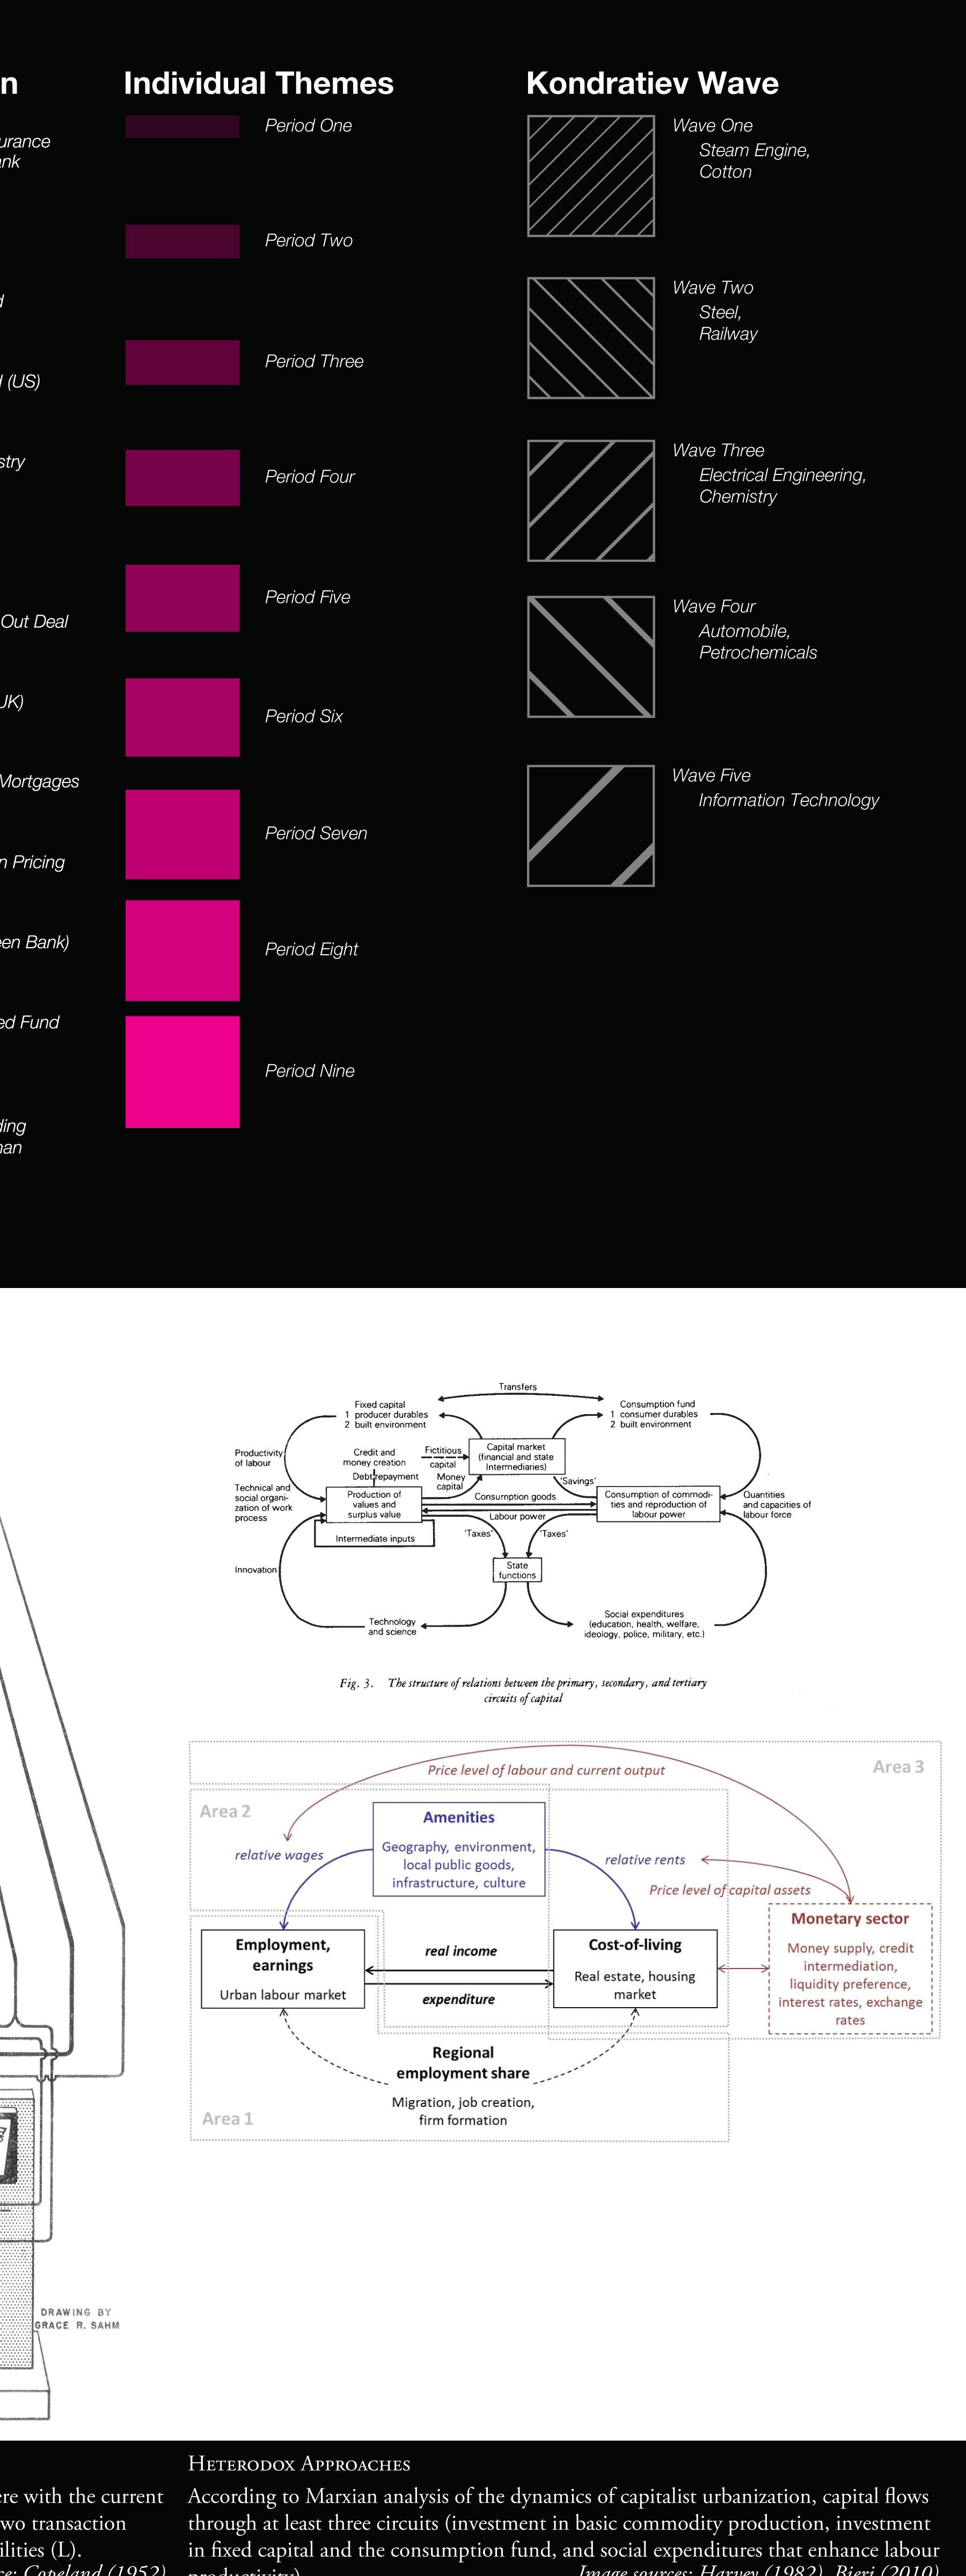 1107_DSB_Panel 3-4_series-7.jpg